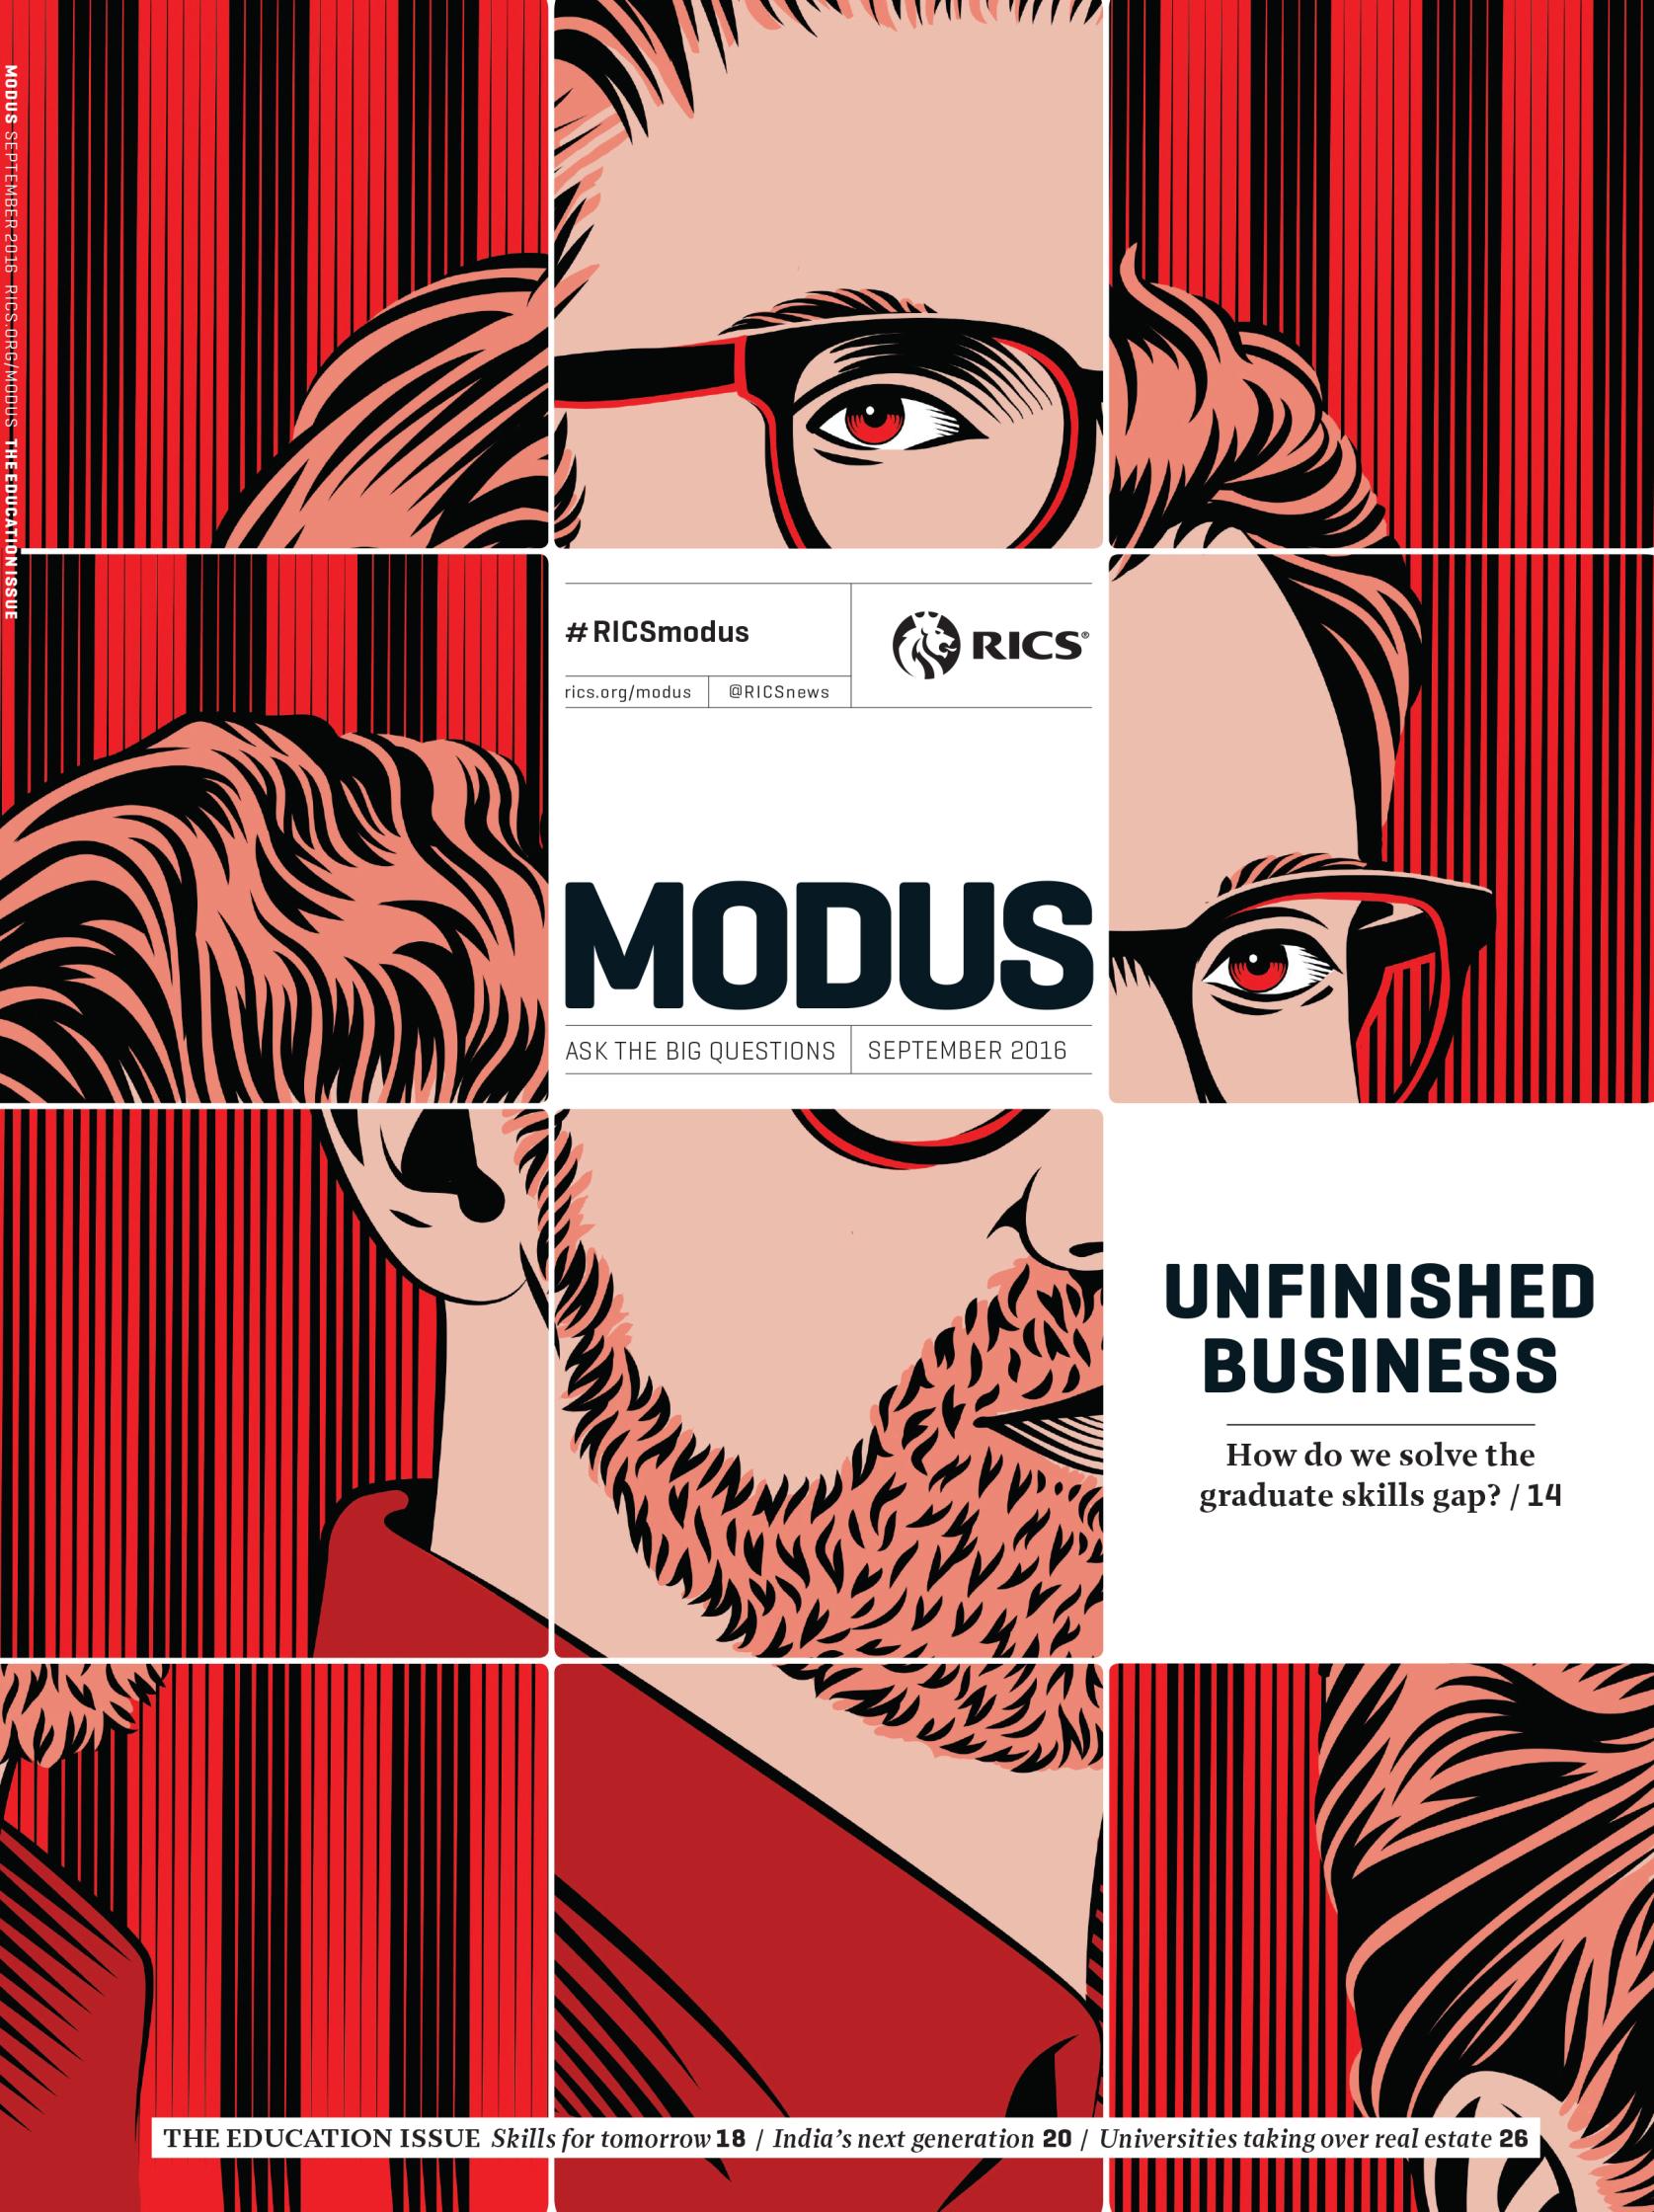 Modus_Sep16_cover.jpeg